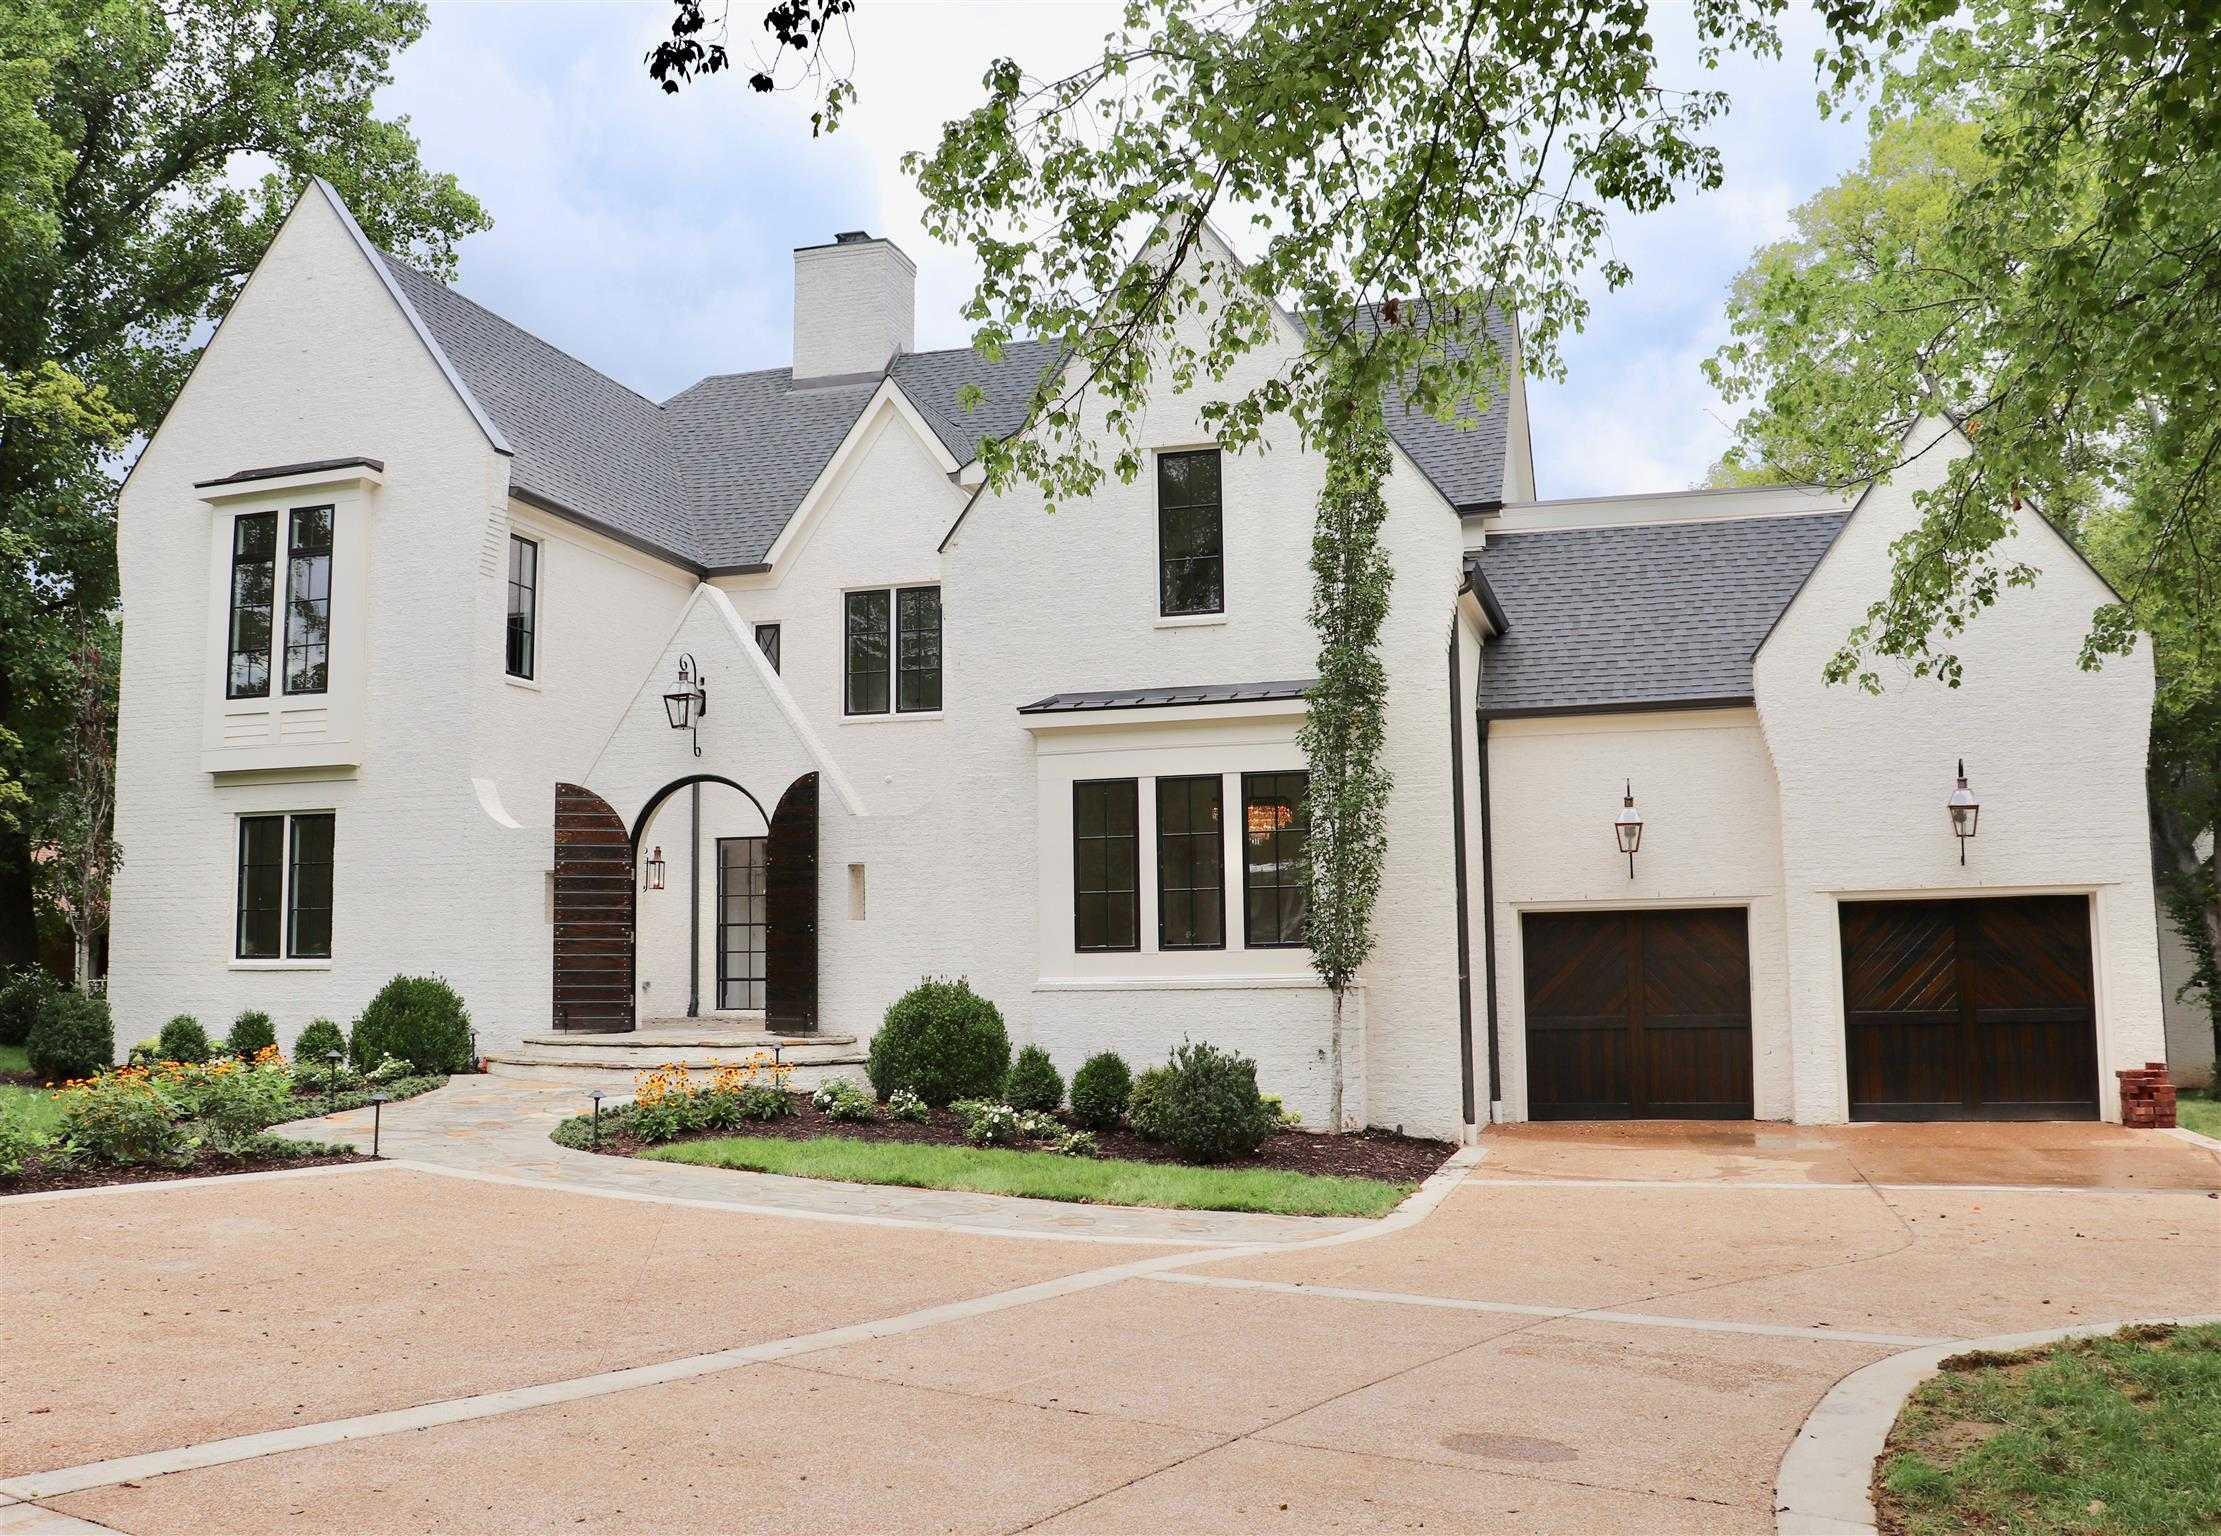 $2,049,000 - 5Br/6Ba -  for Sale in None, Nashville